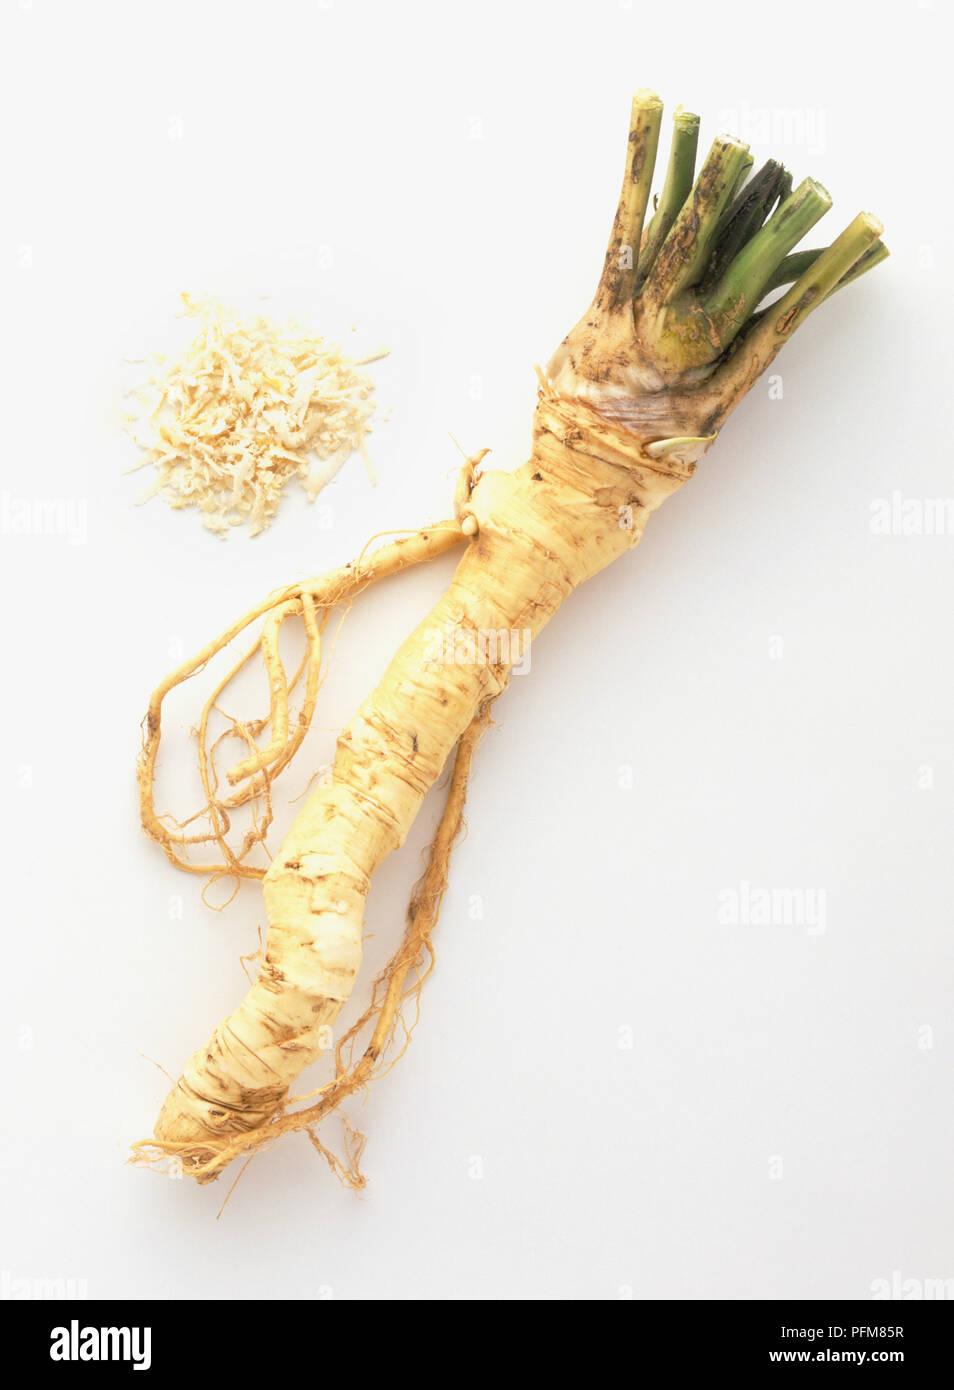 Amoracia rusticana, Horseradish, whole and grated - Stock Image